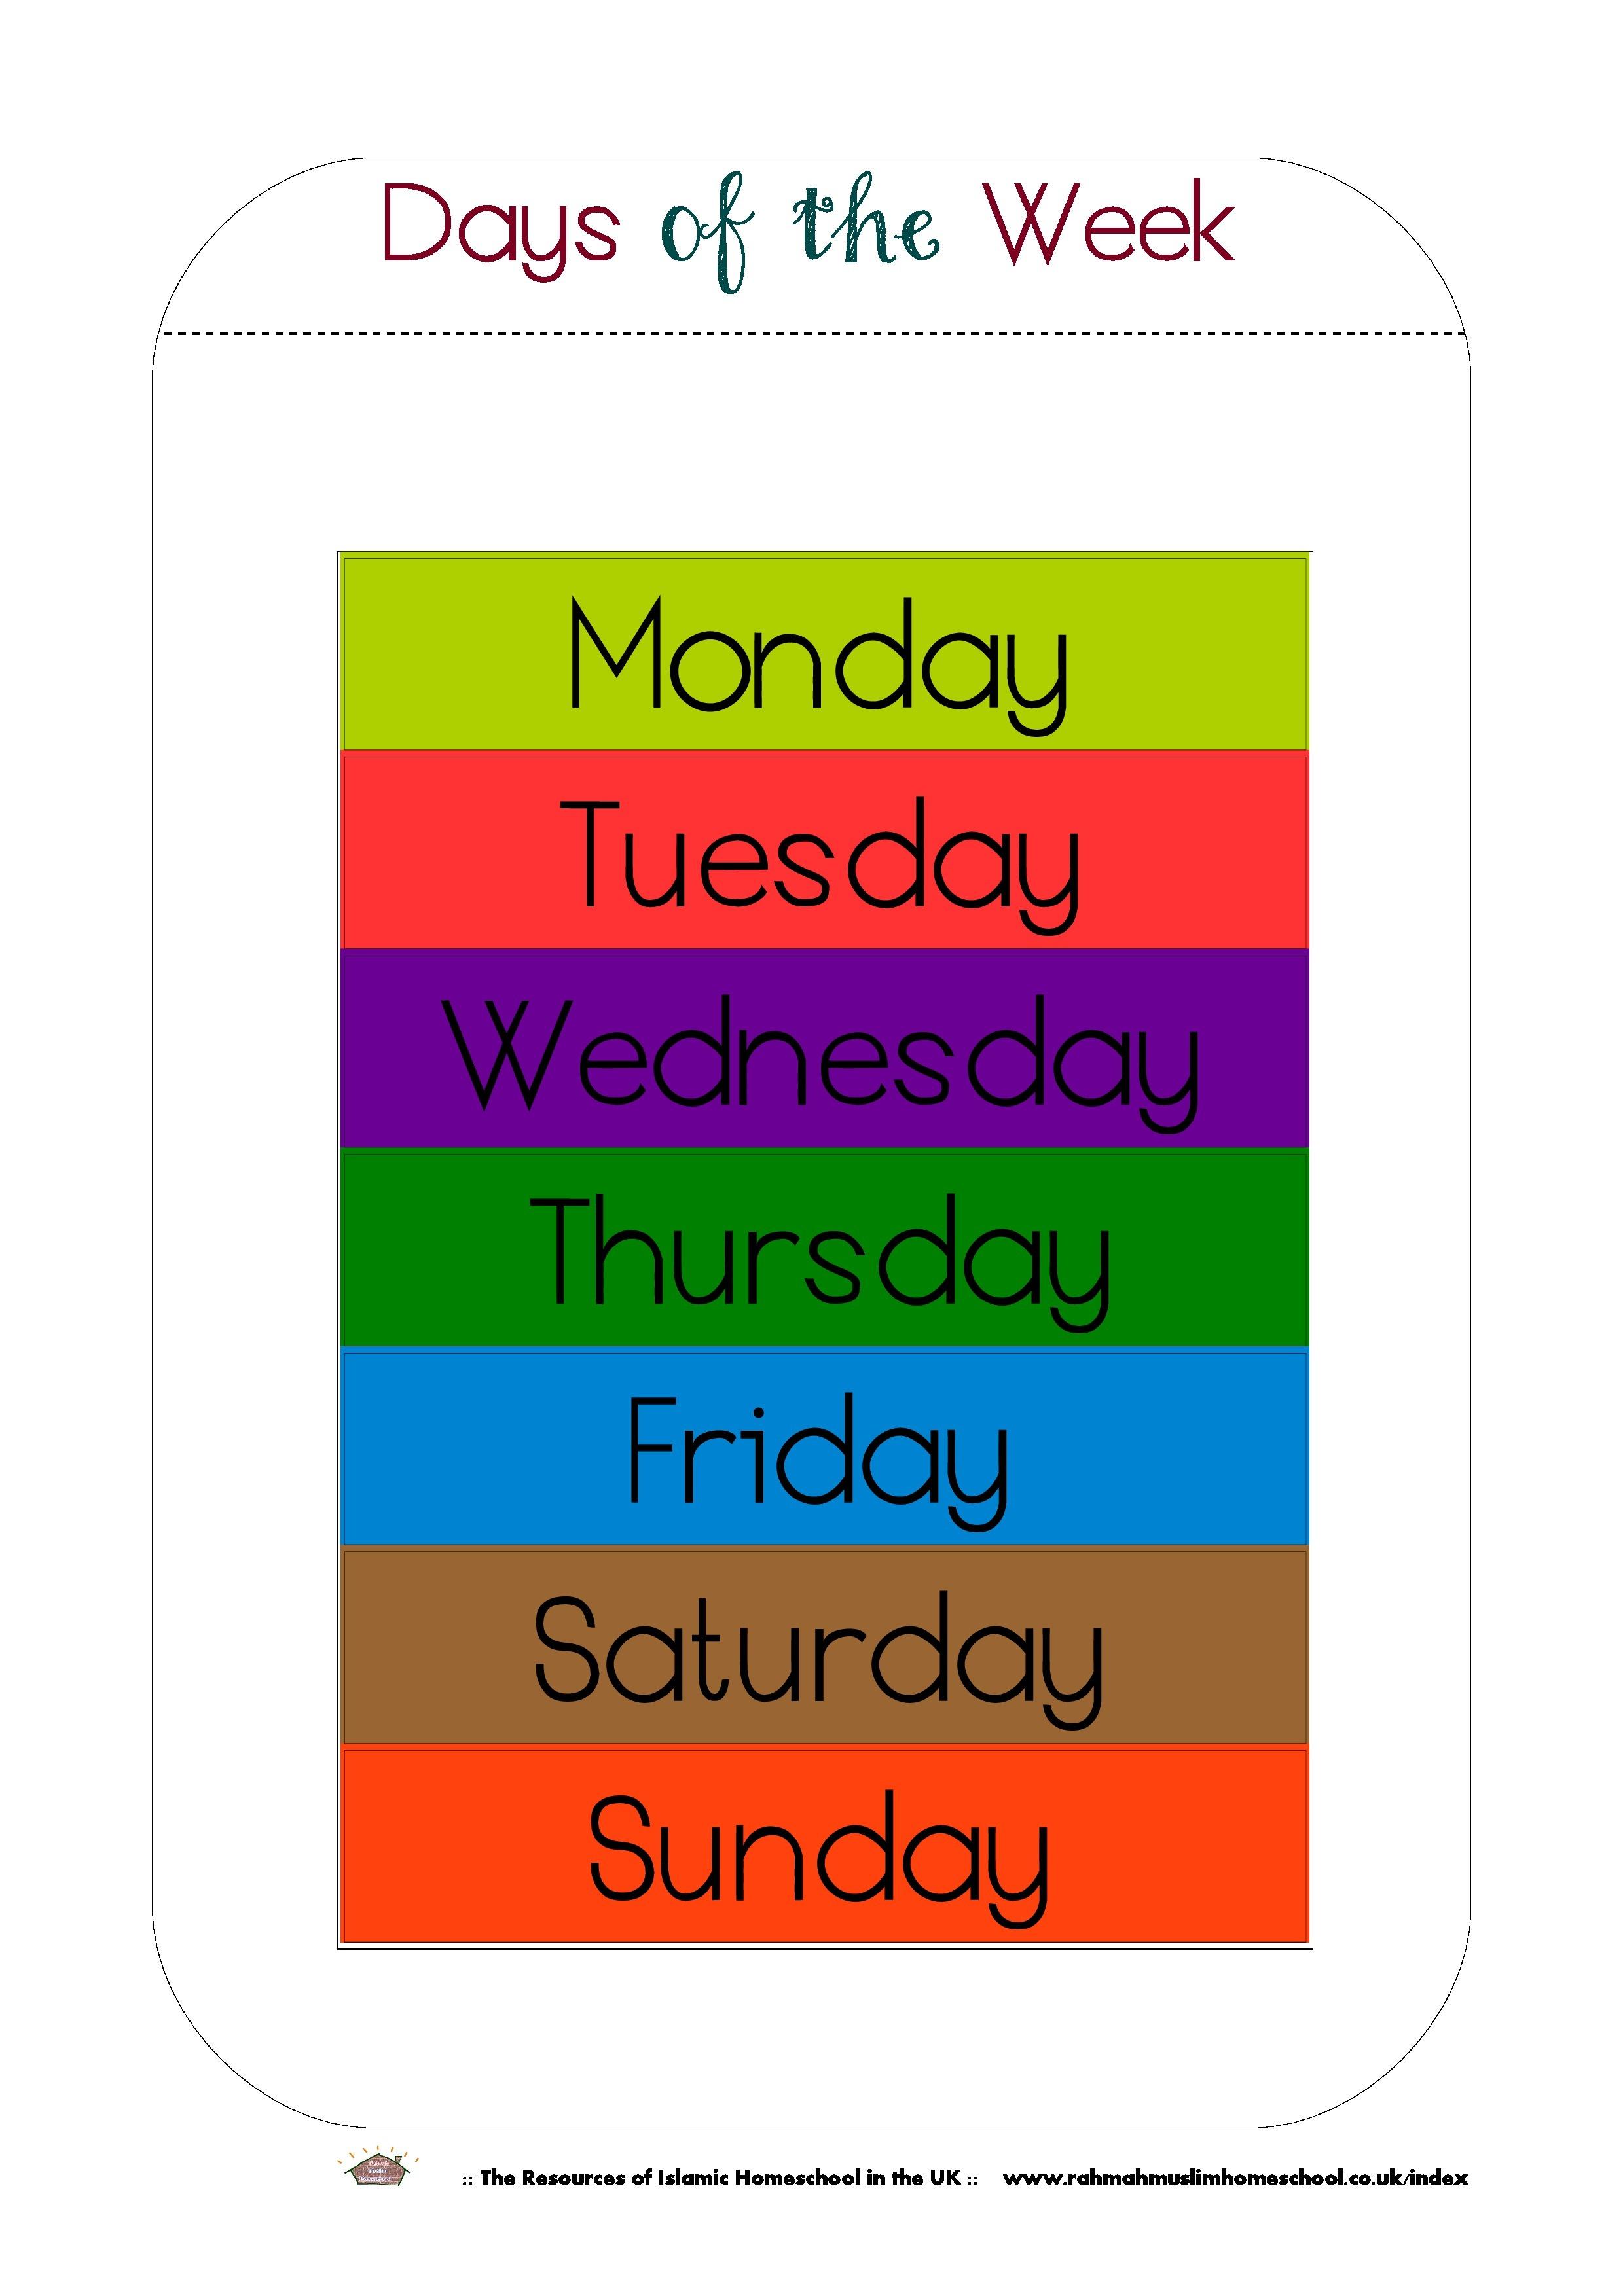 Free Printable Days Of The Week Workbook And Poster | The Resources - Free Printable Days Of The Week